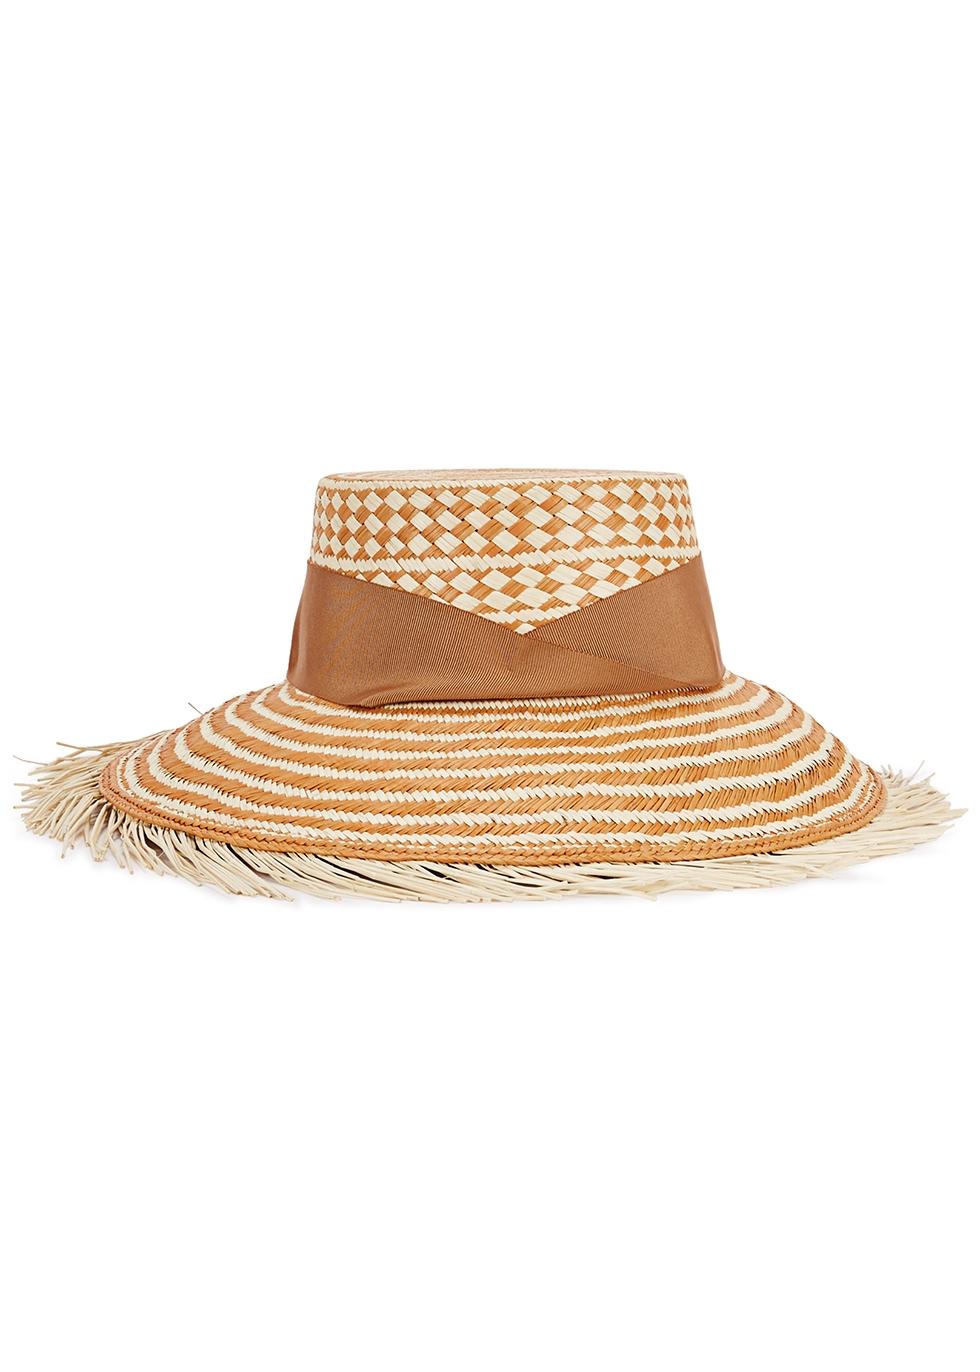 Hippie straw Panama hat - Sensi Studio